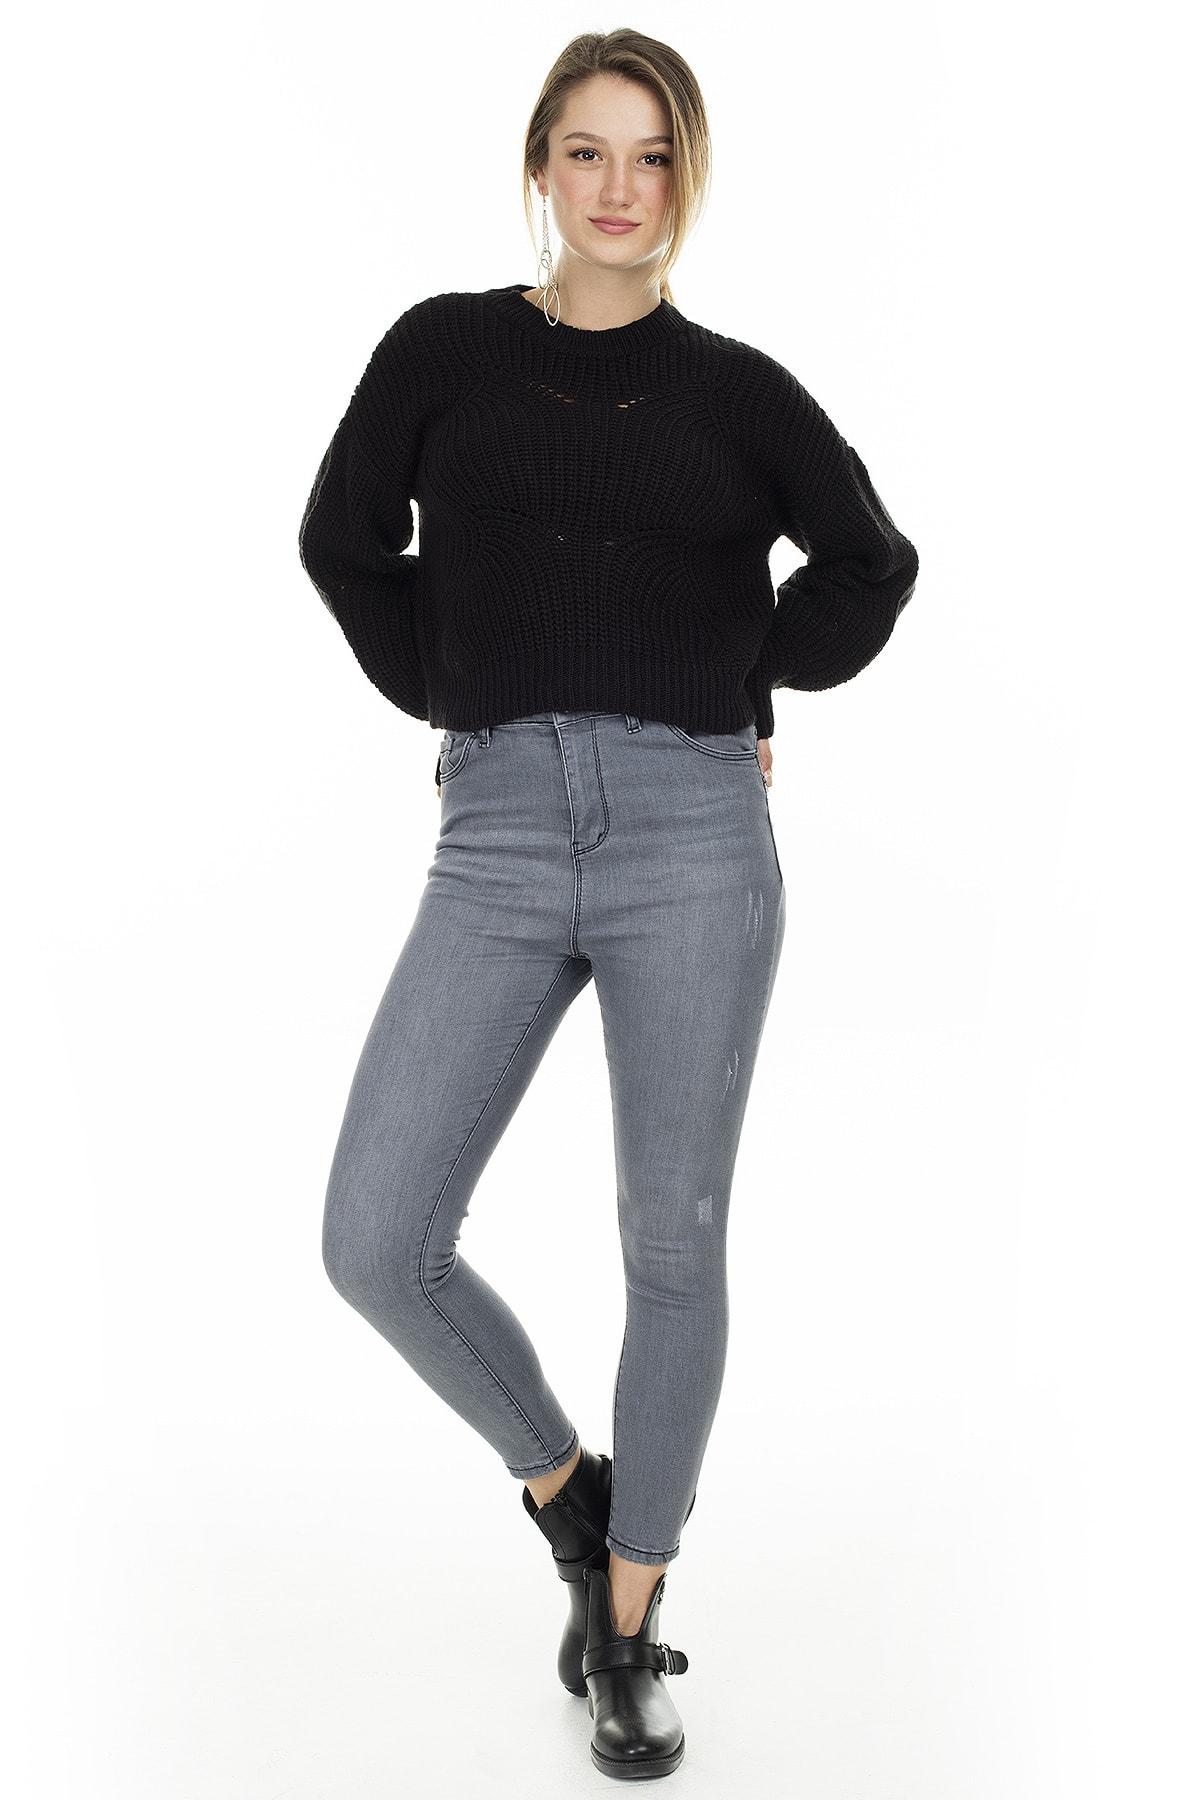 Lela Yüksek Bel Skinny Jeans KADIN KOT PANTOLON 58713269